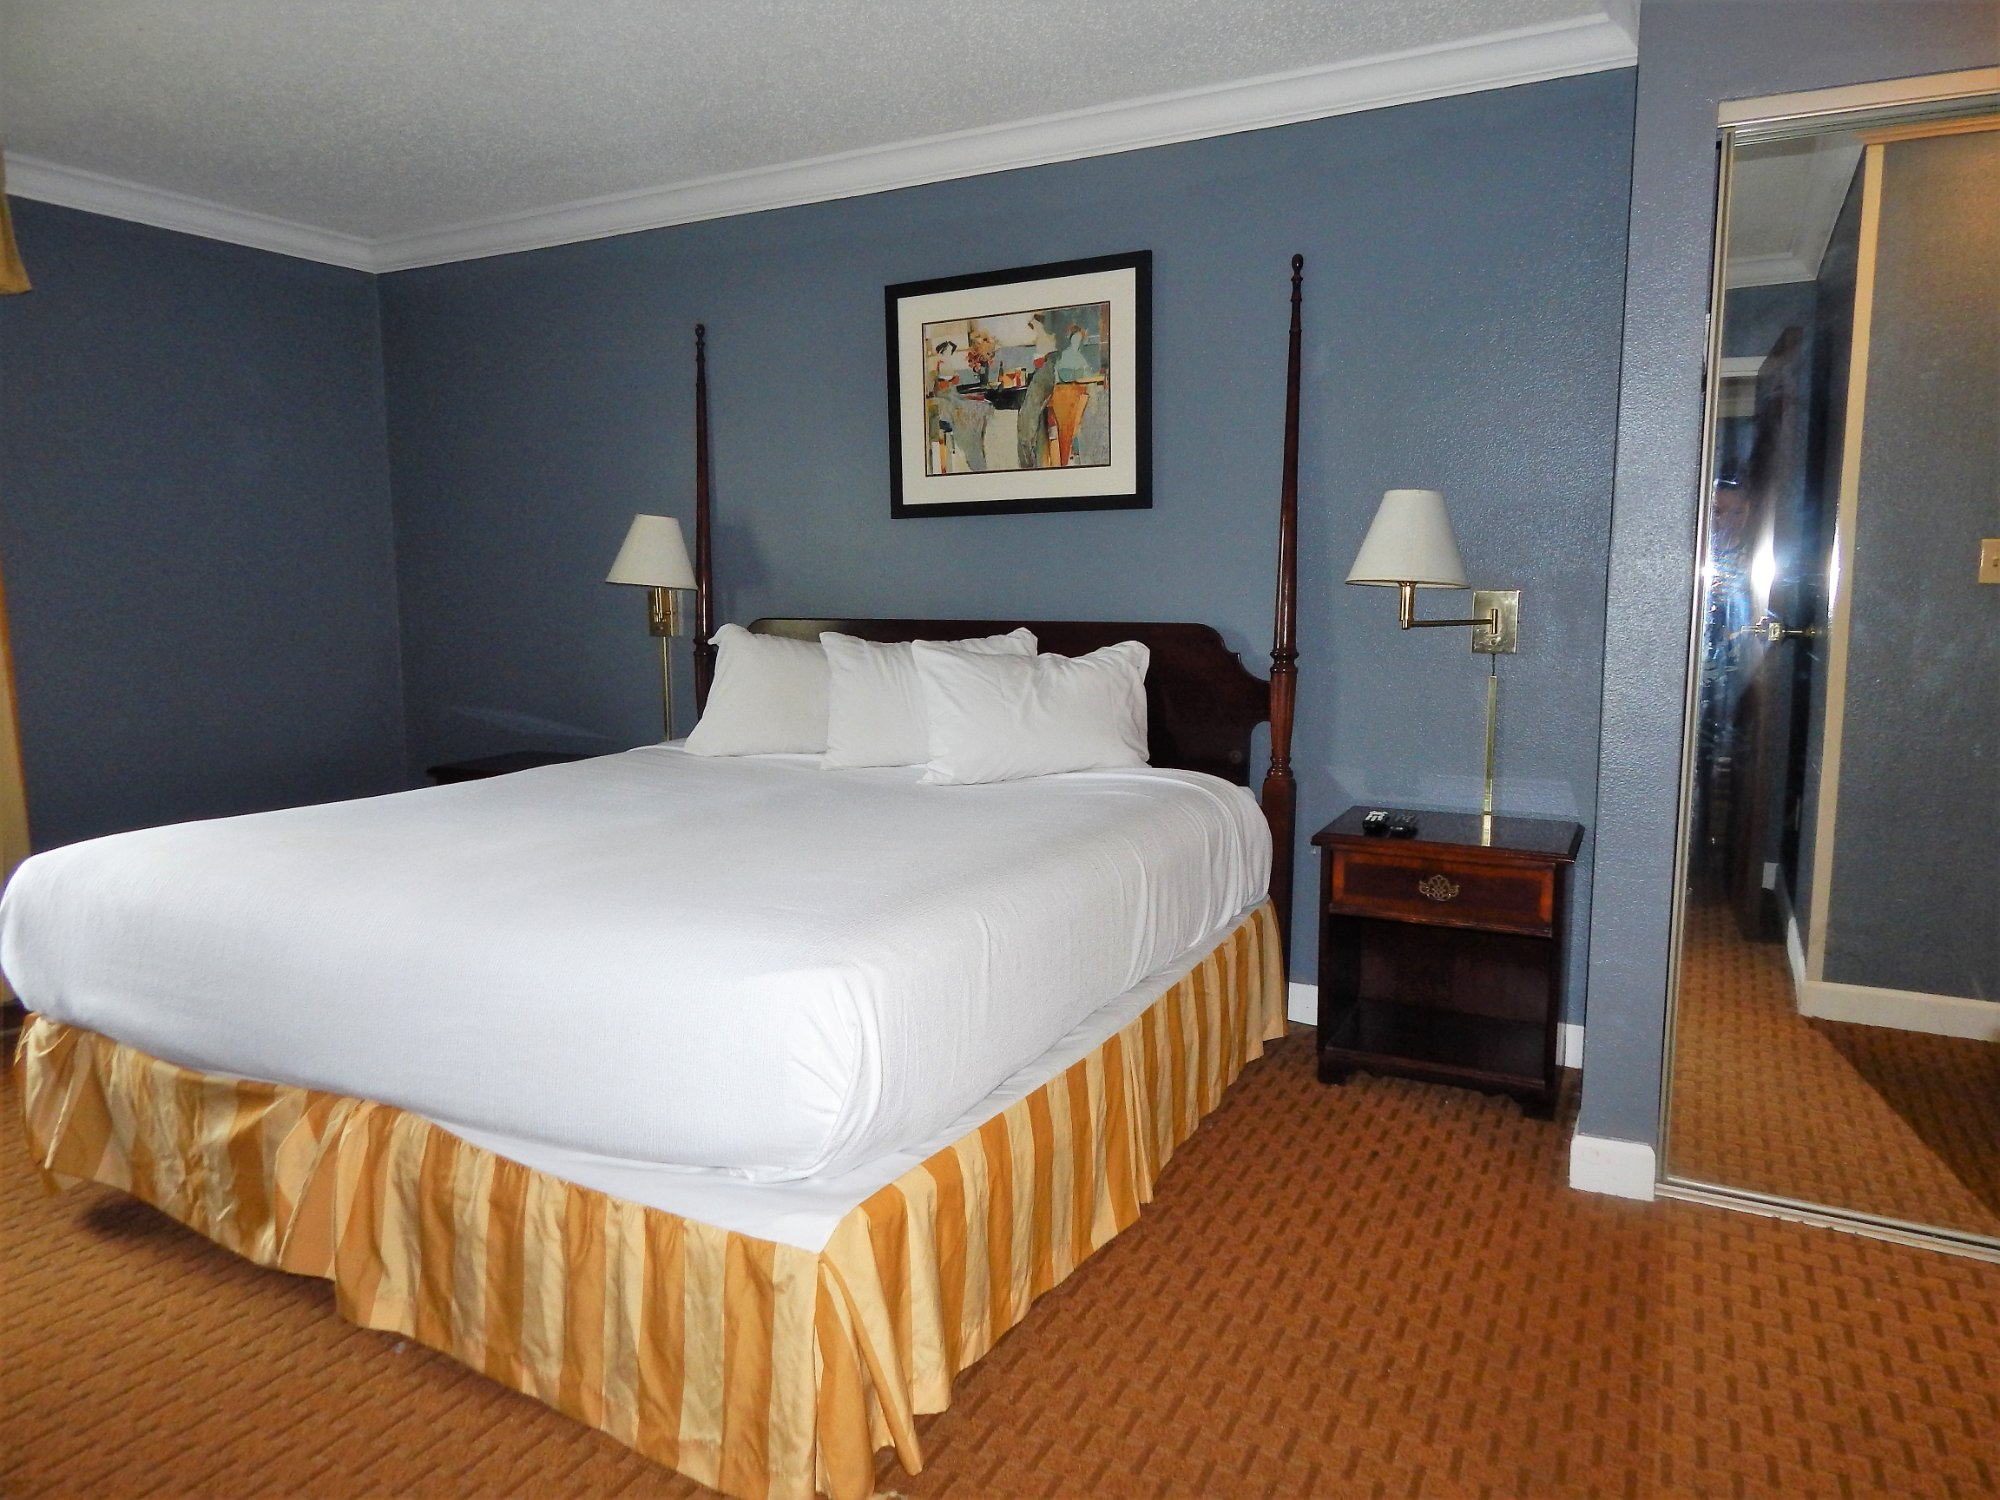 The Richmond Suites Hotel